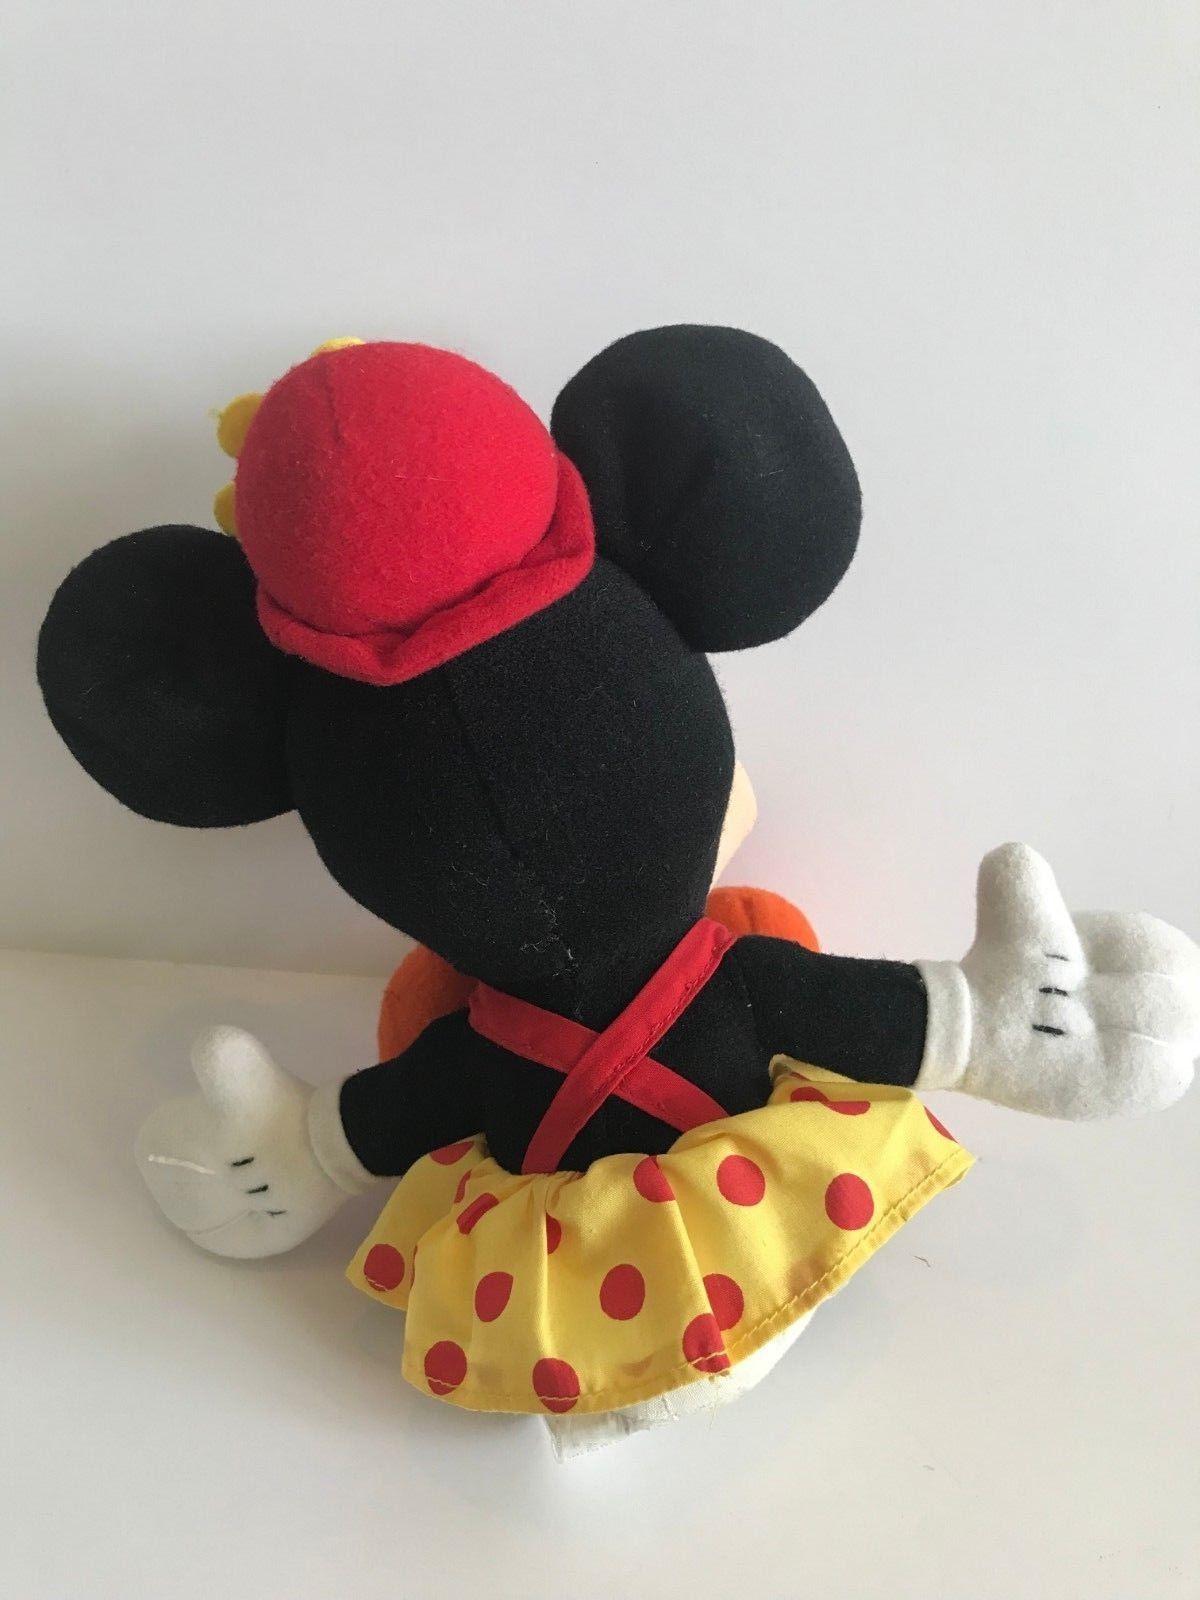 Mattel Arcotoys Minnie Mouse Yellow Red Polka Dot Flower Hat Plush Stuffed Doll image 5